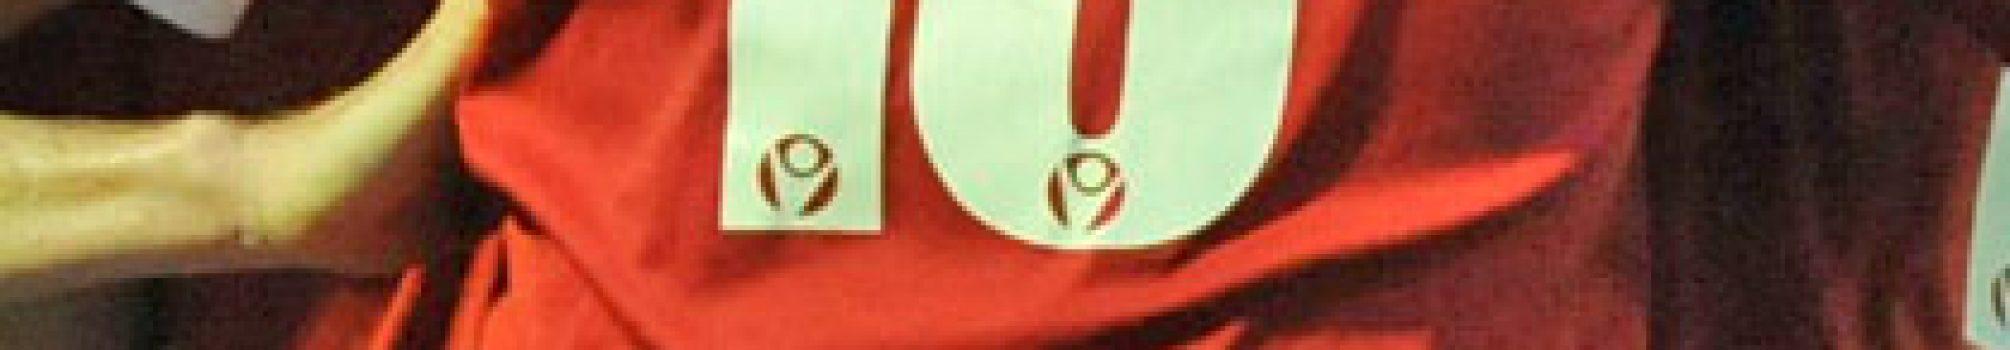 shirt-number